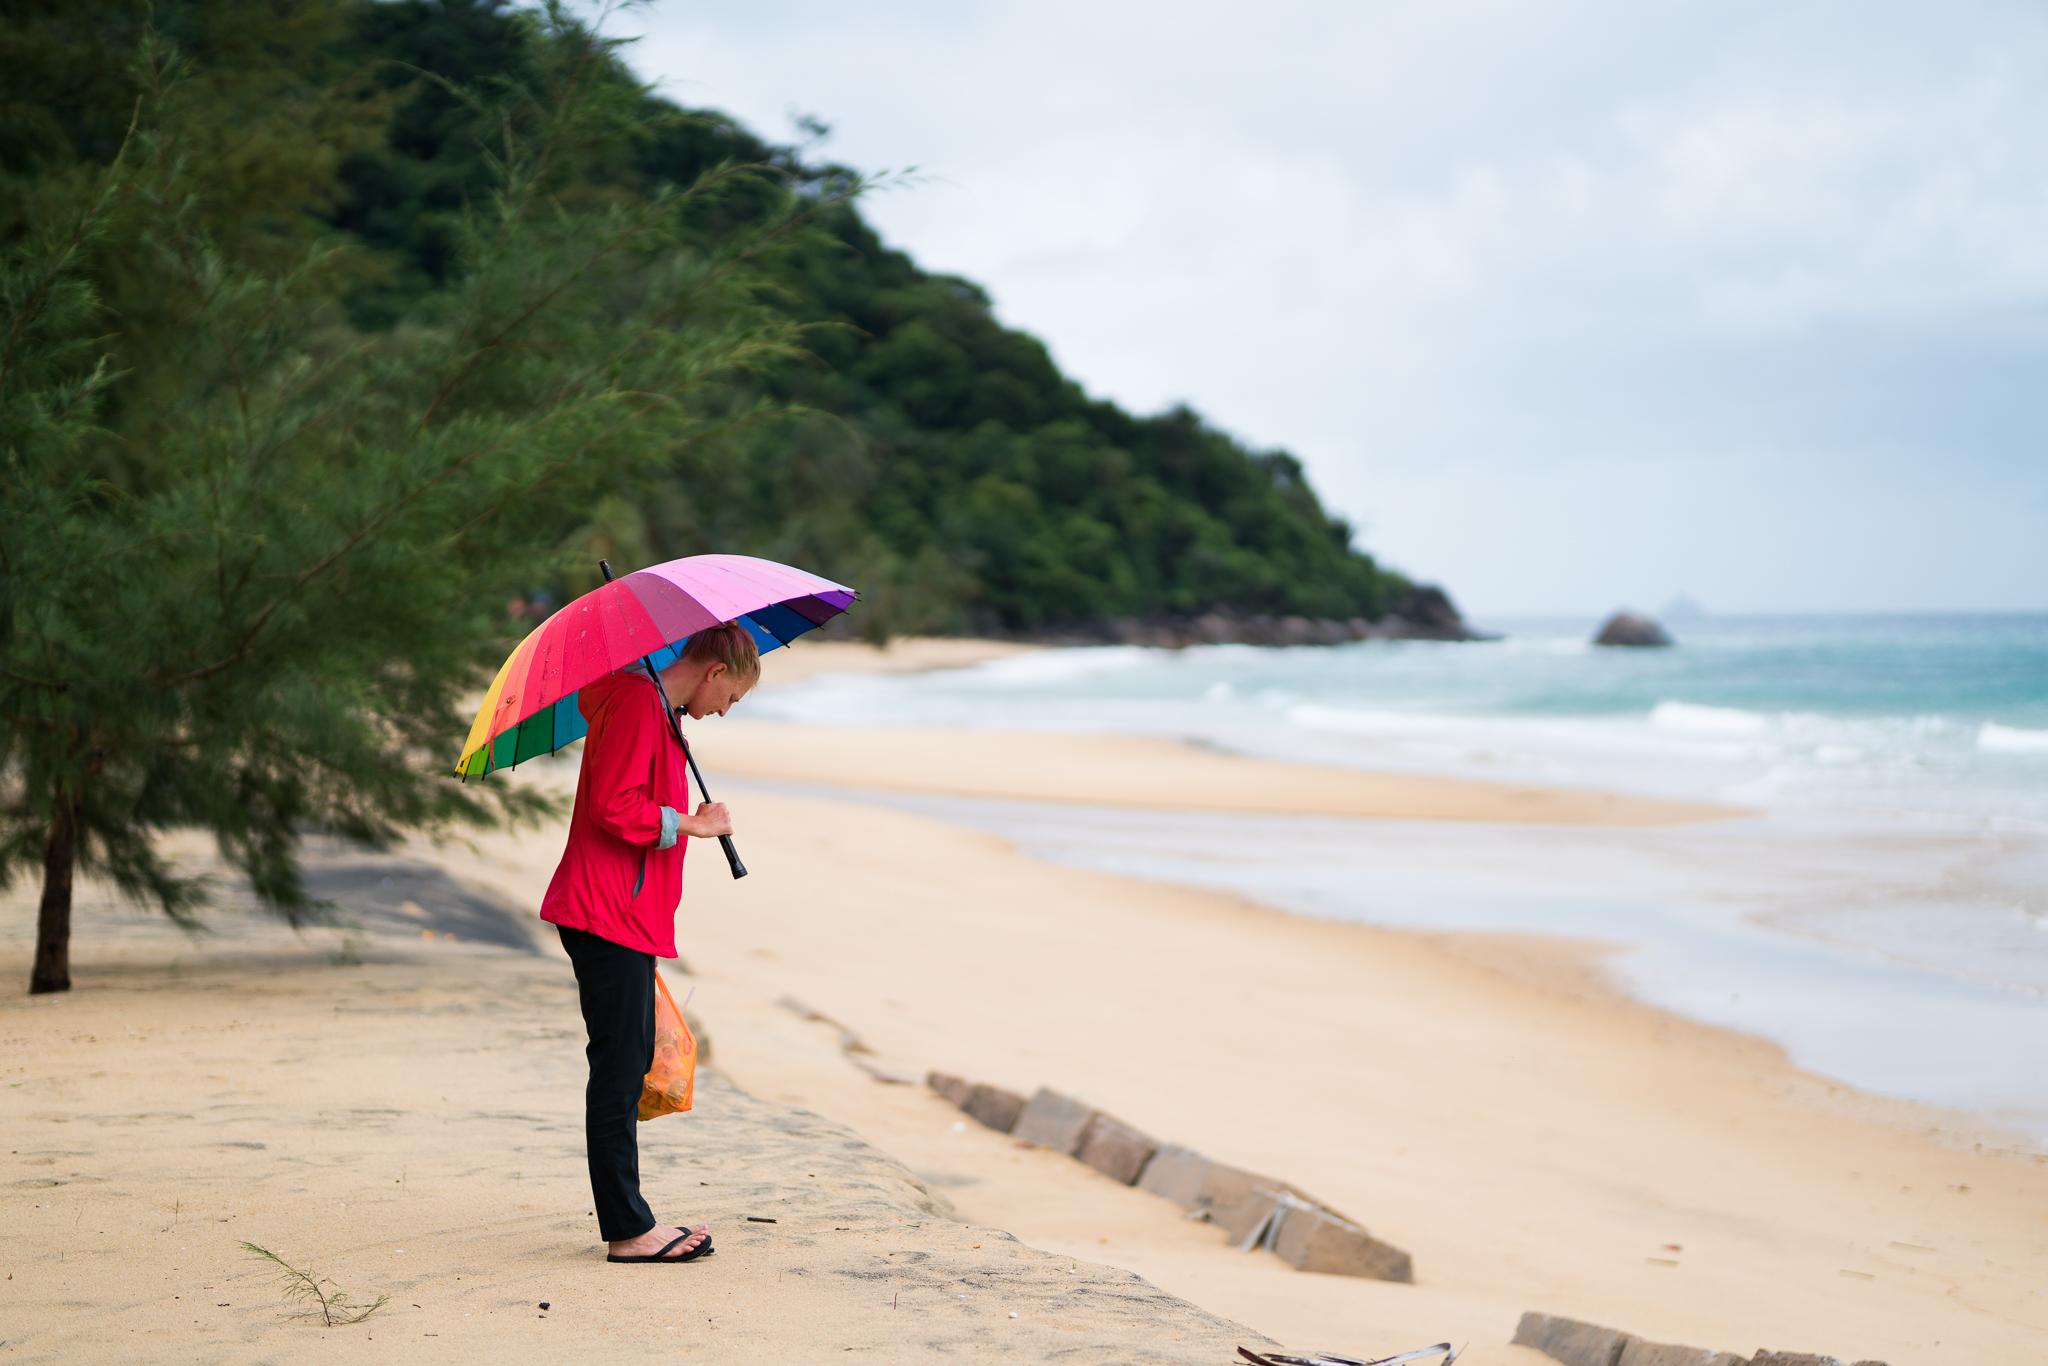 Rainy days in paradise